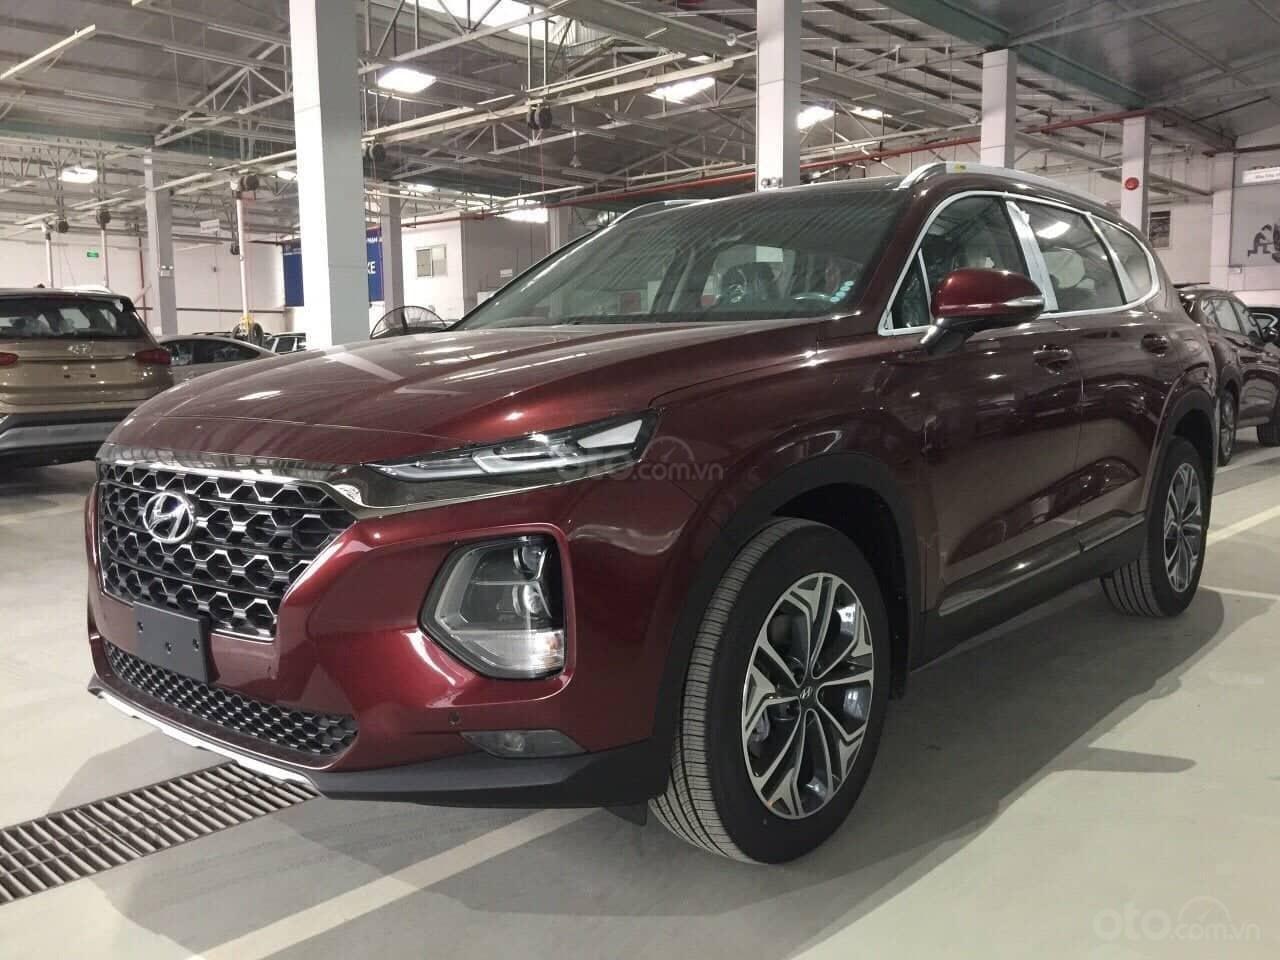 Giảm nóng 50% TTB - Hyundai Santa Fe 2020 - Giá hời mùa Covid (2)